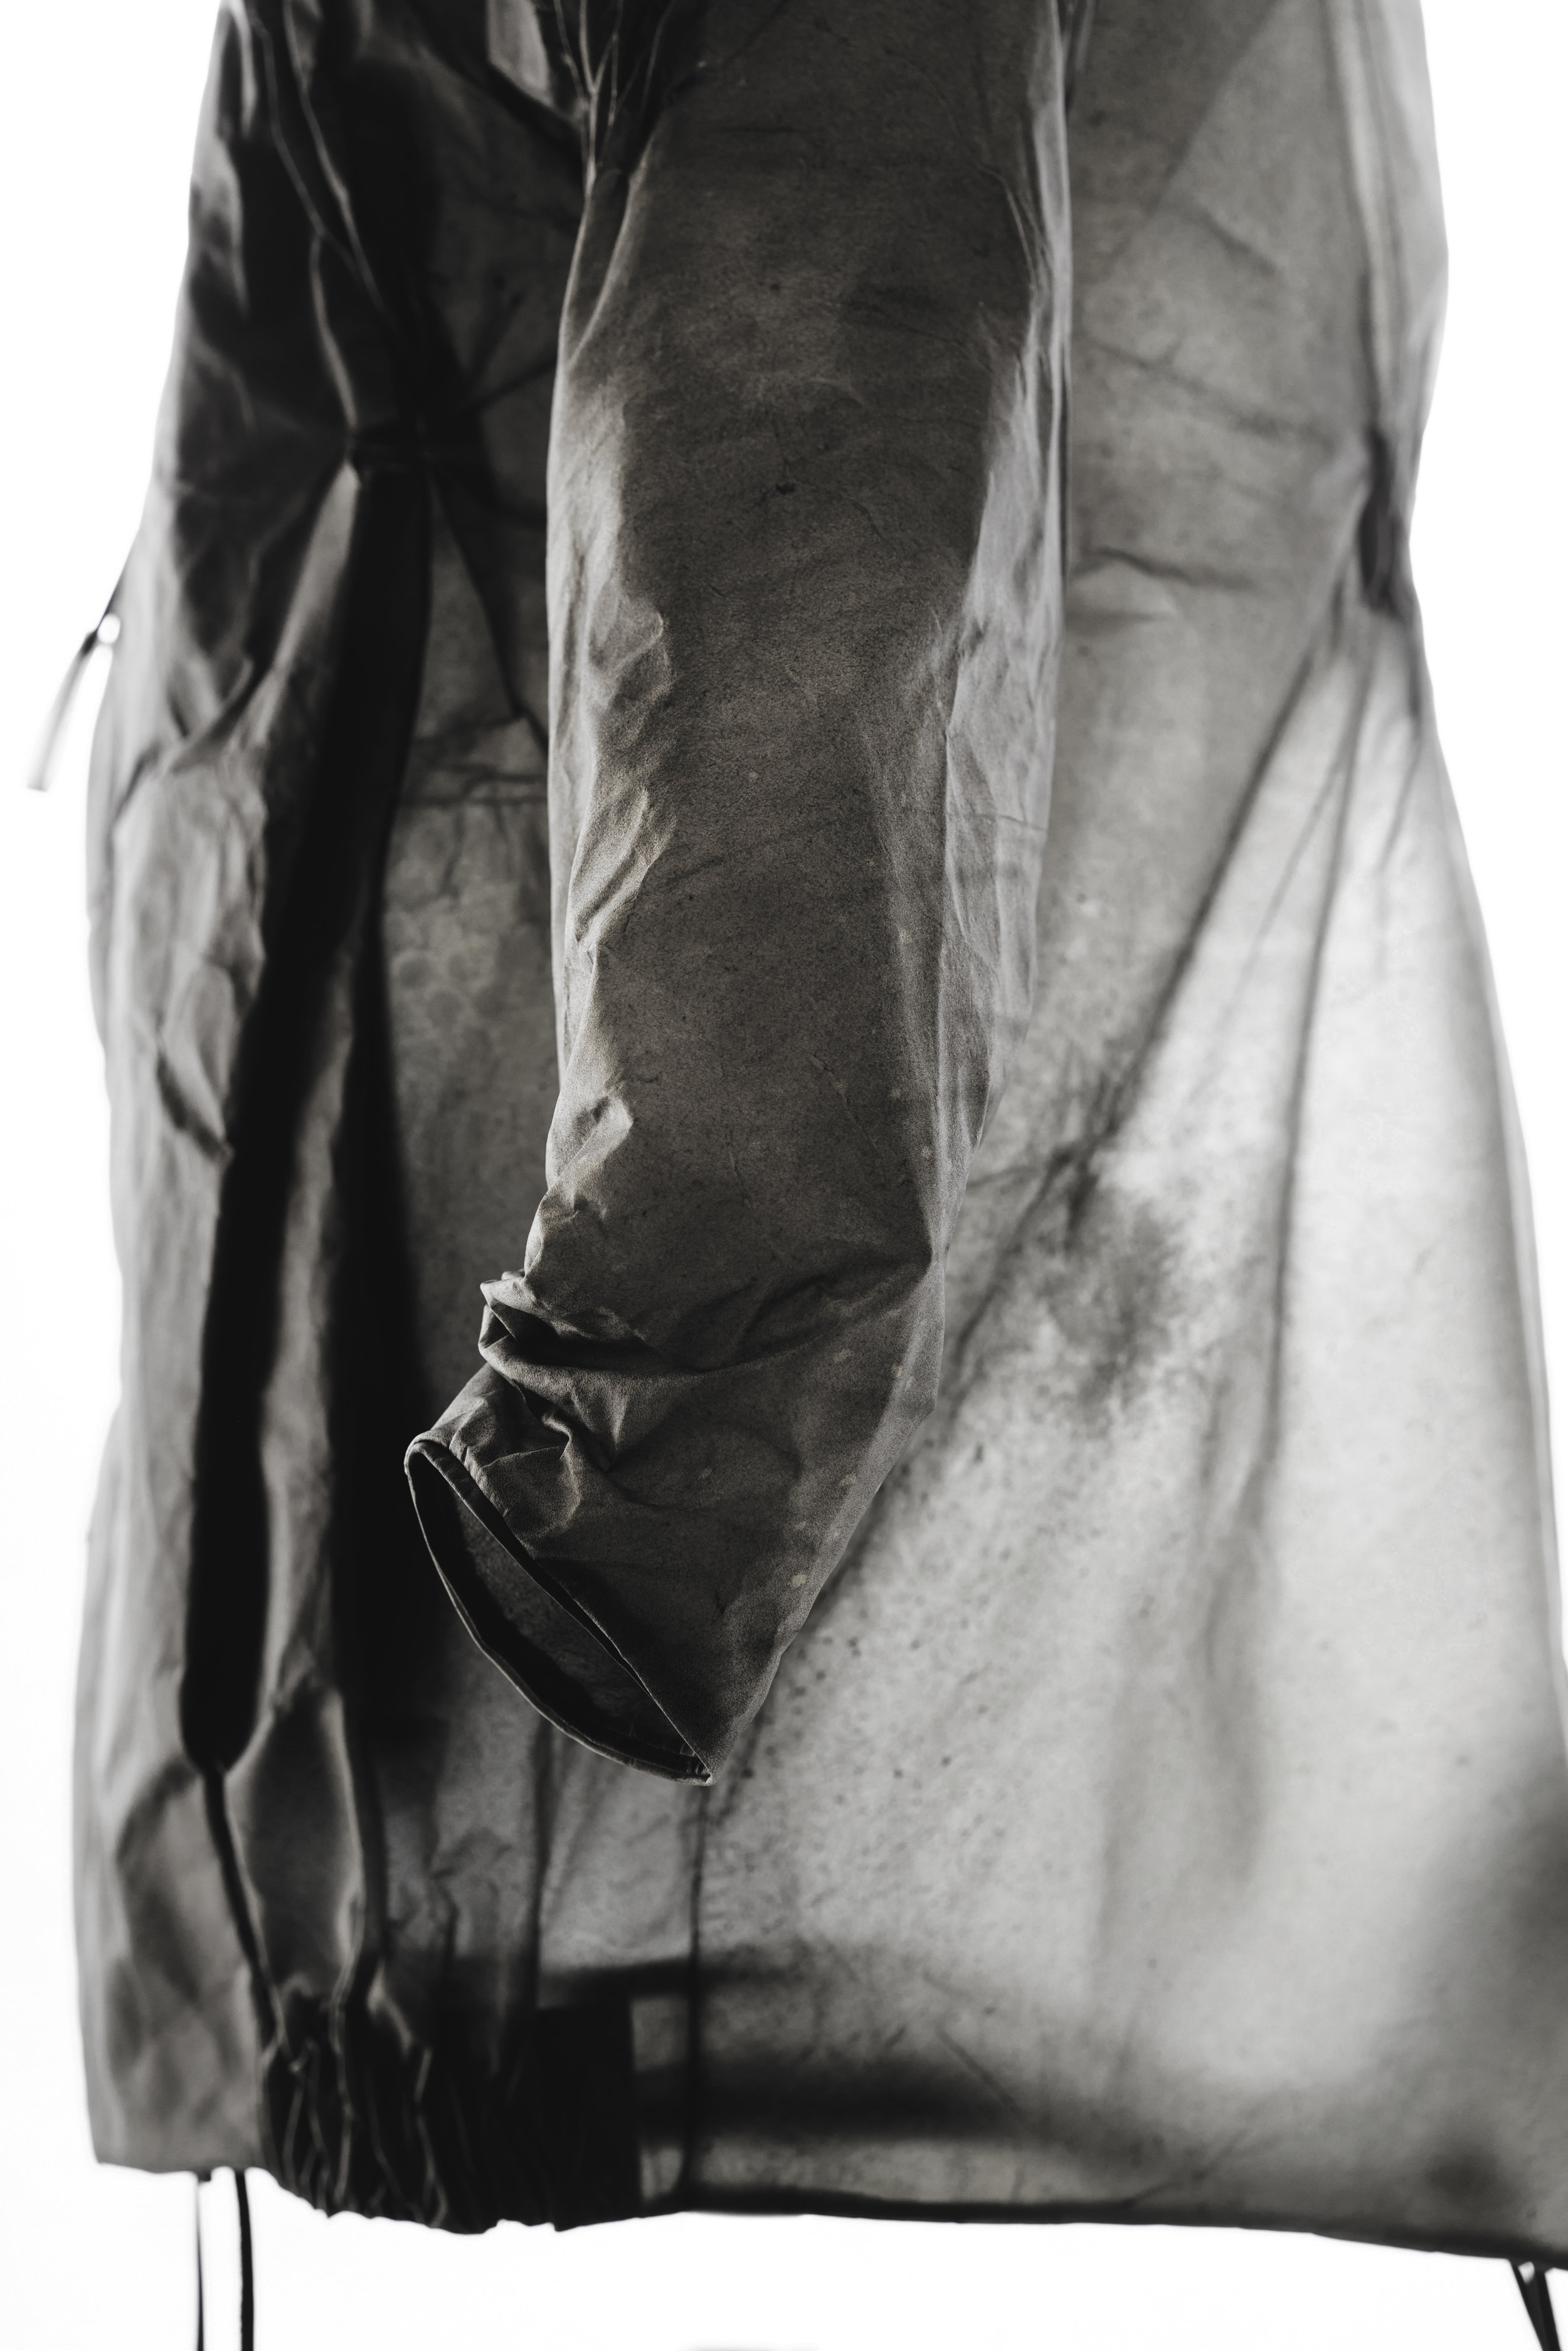 APPARITION - Coat Soft Black Detail 3.jpg